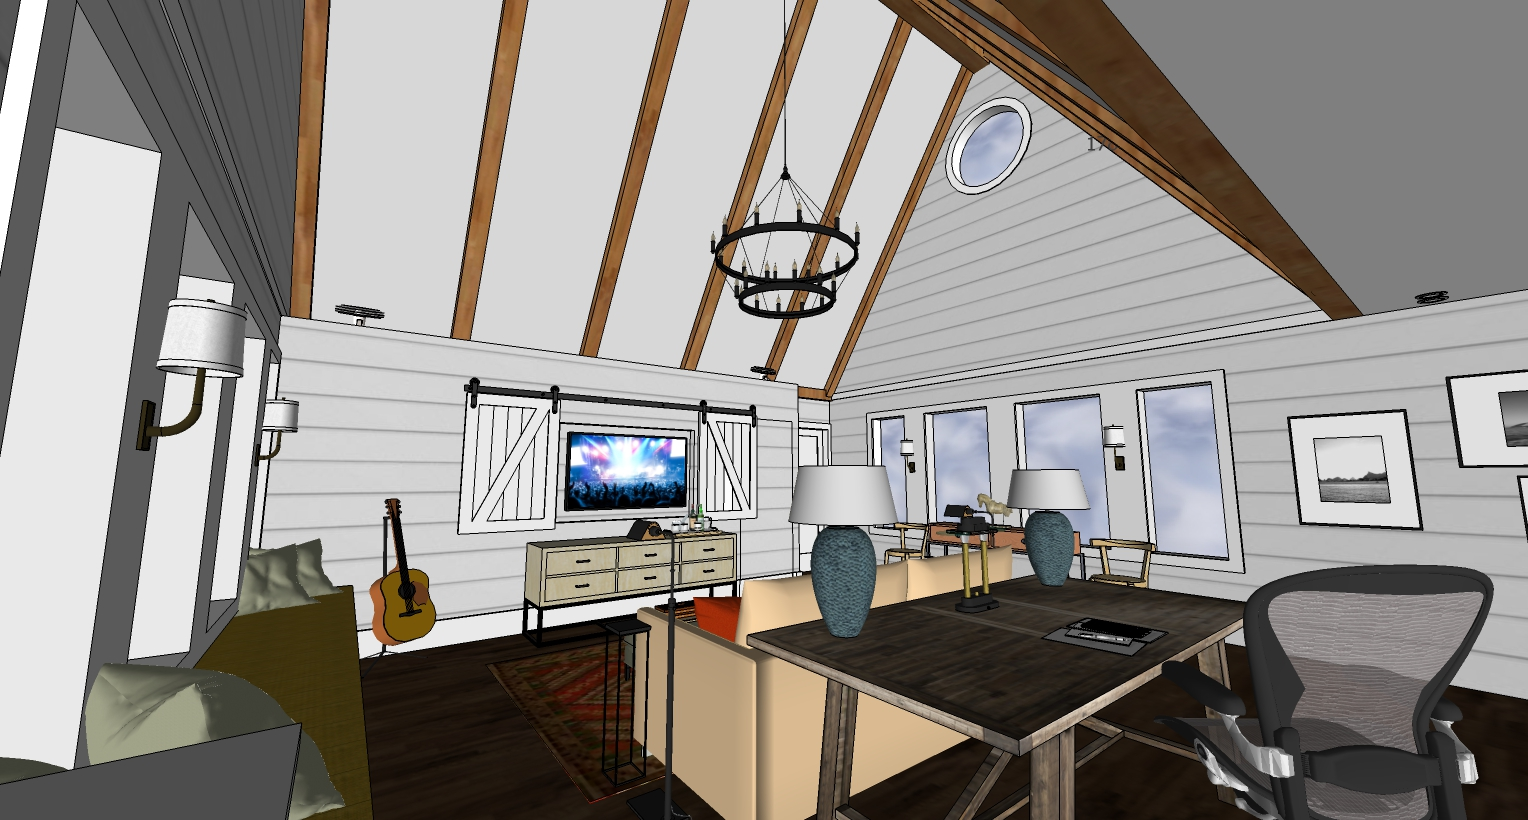 designgene, modern farmhouse, barndoors, family room remodel, Potomac home office, interior design, interior decorating 3.jpg